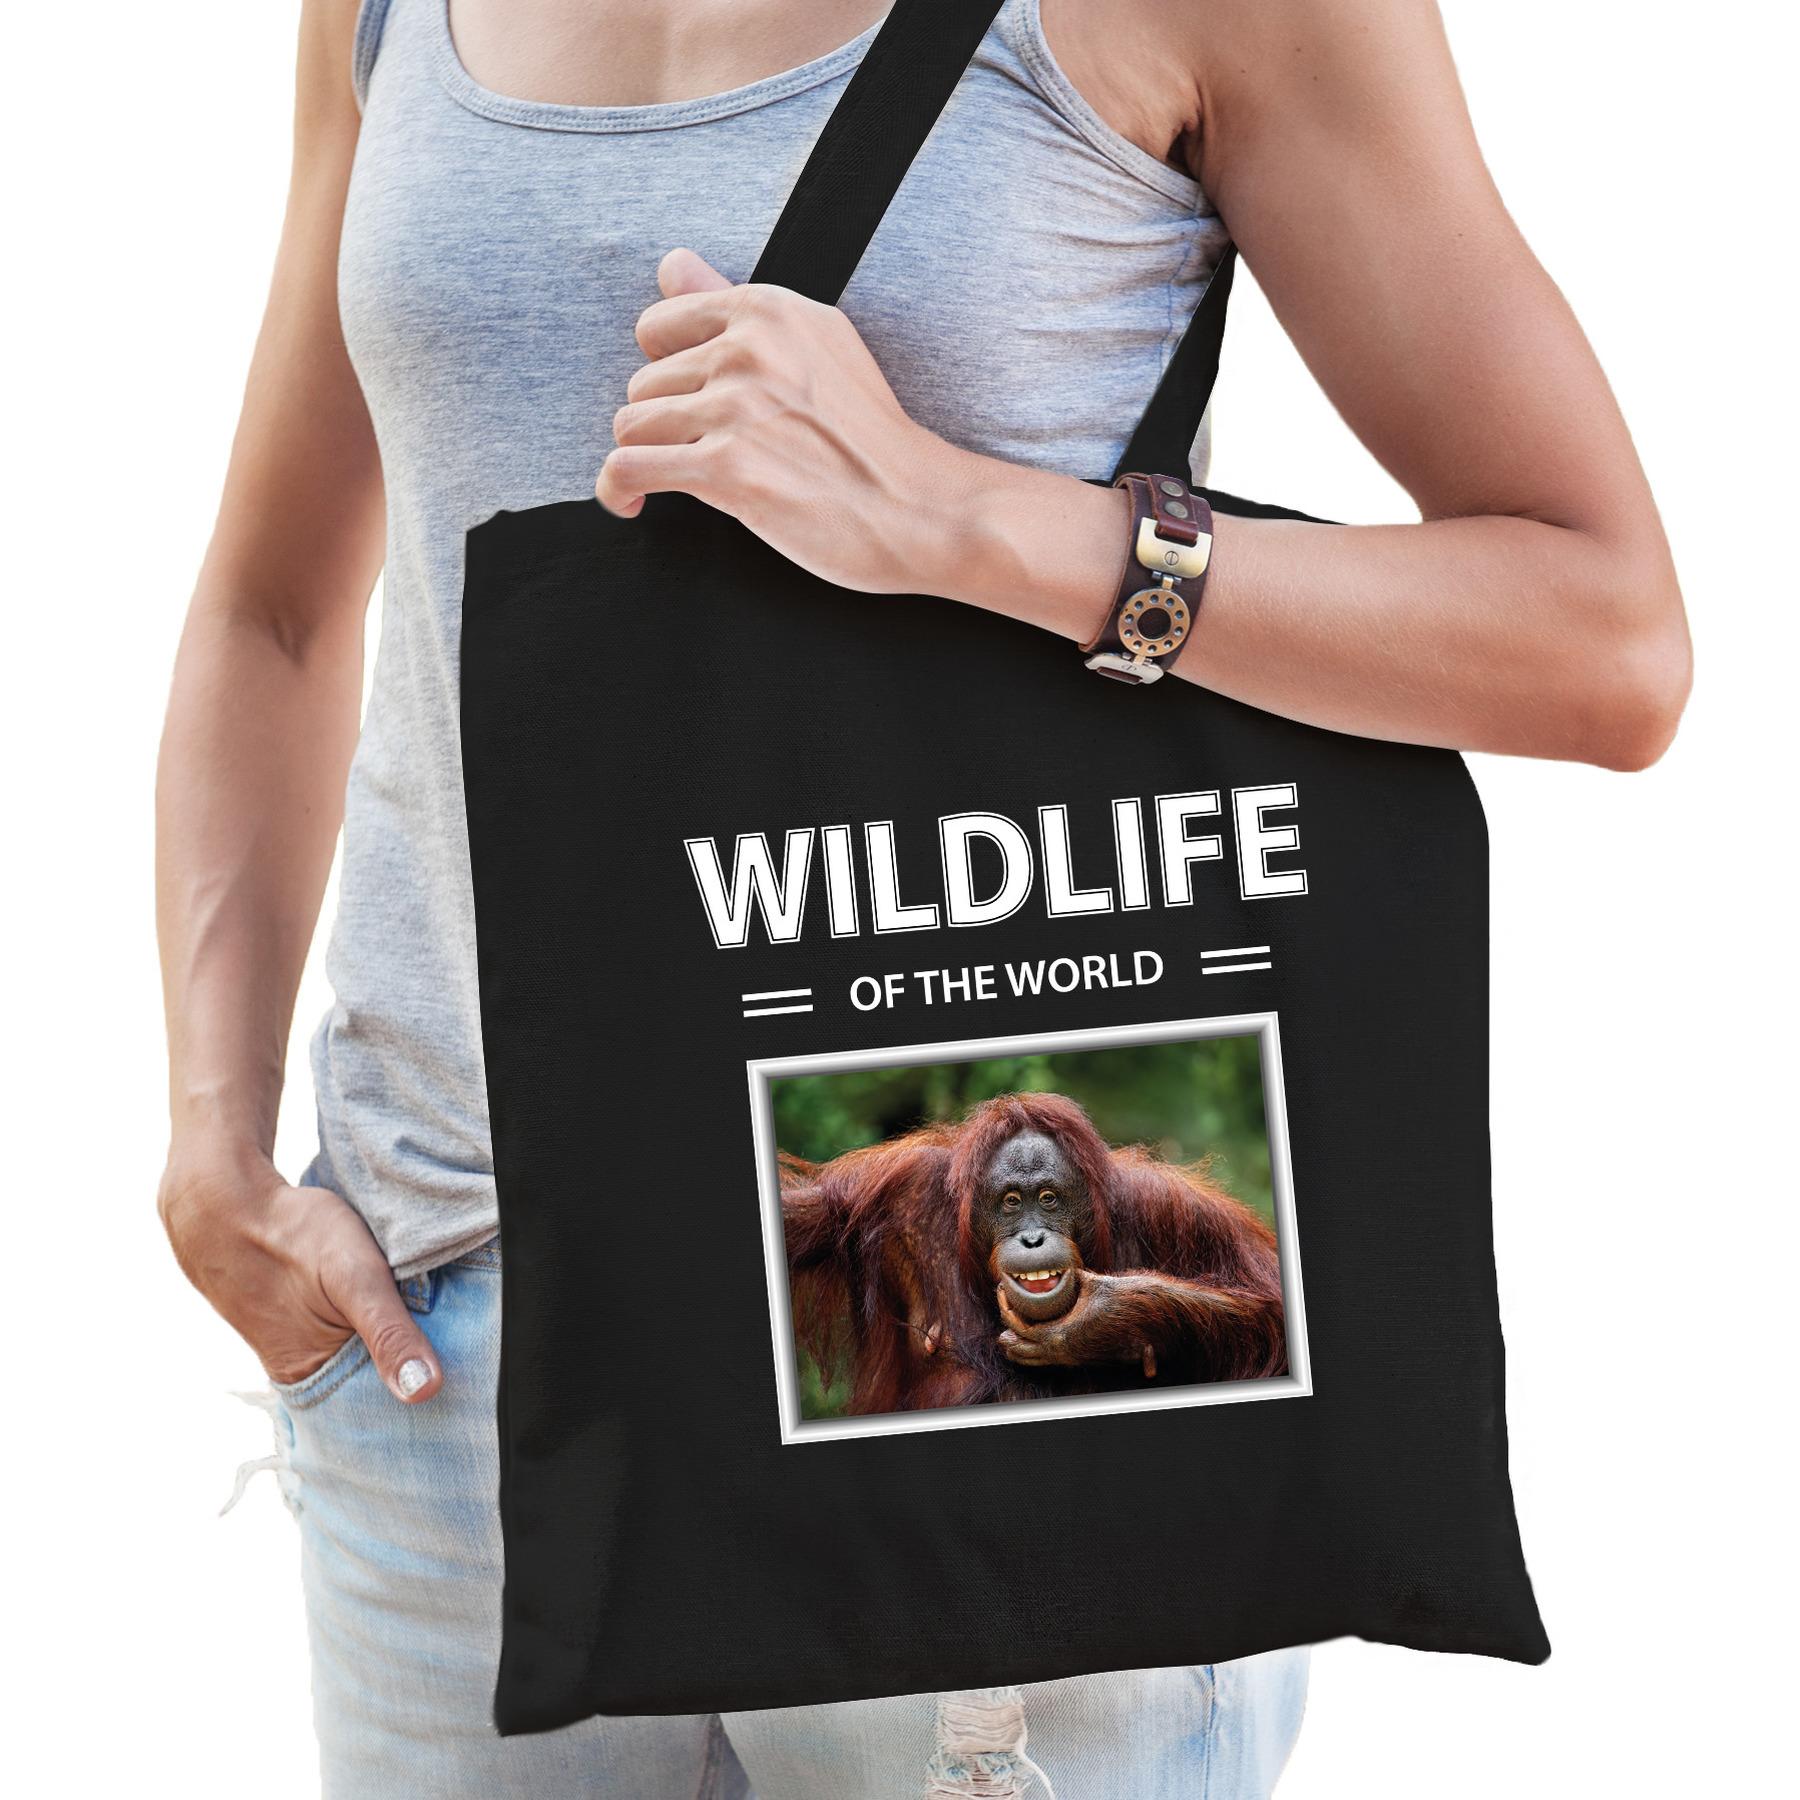 Katoenen tasje Orang oetan apen zwart - wildlife of the world Aap cadeau tas